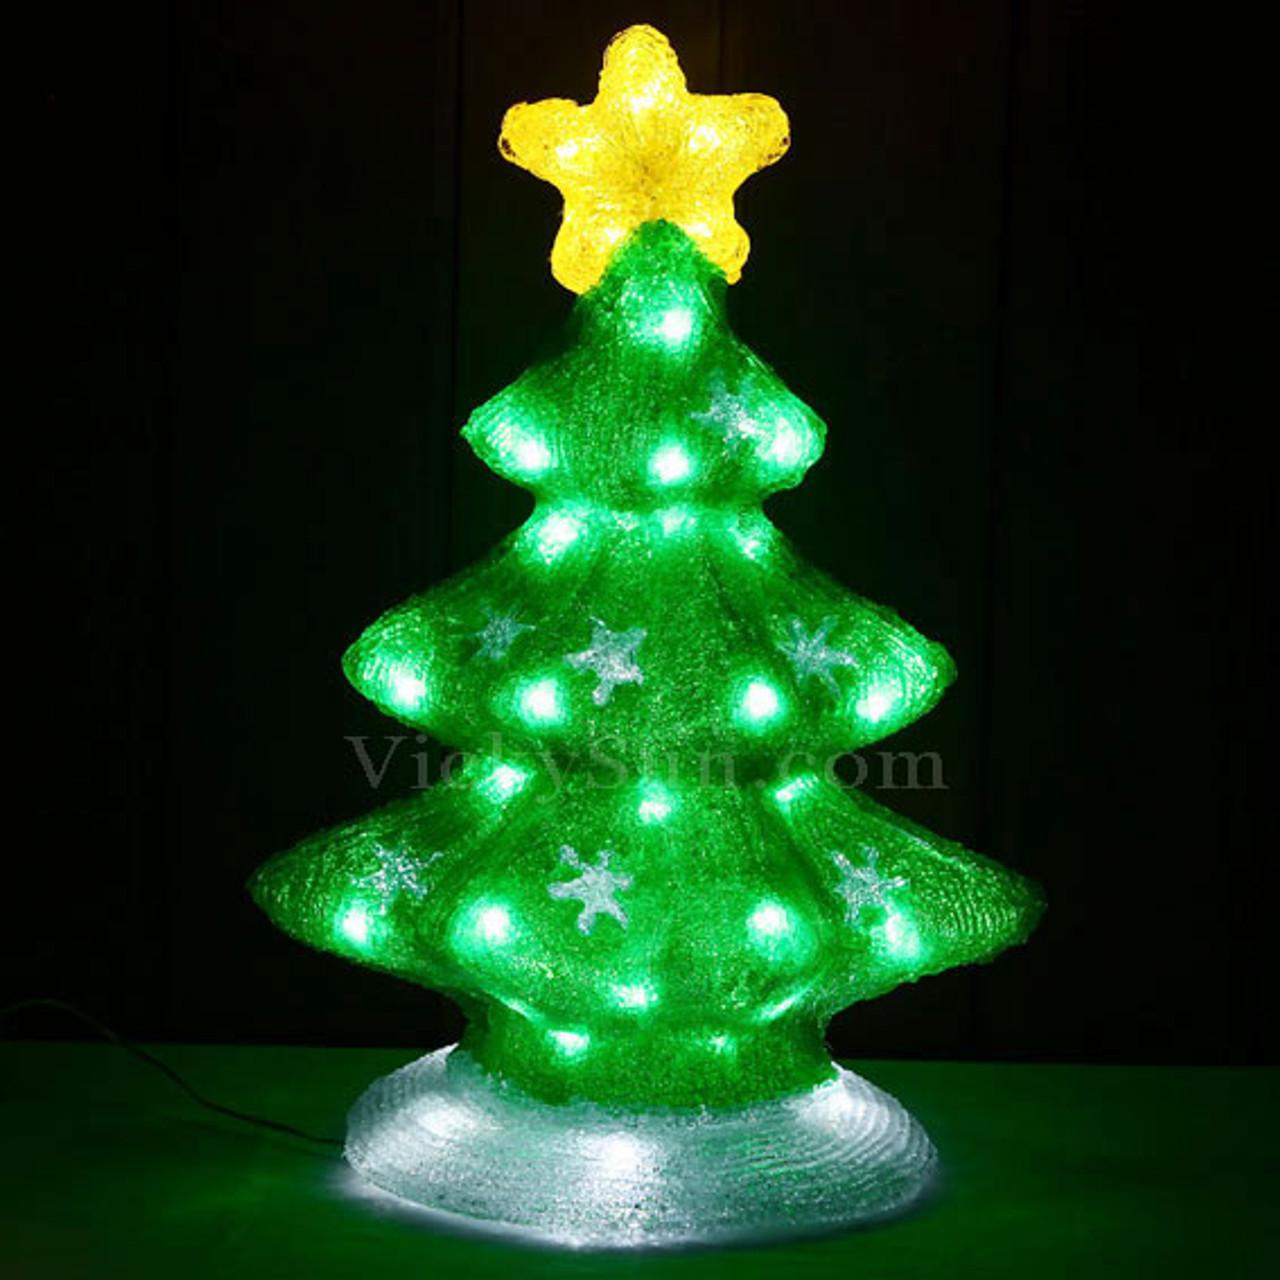 Led Christmas Tree Lights.51cm 3d Acrylic Christmas Green Tree With 60 White Led Christmas Lights